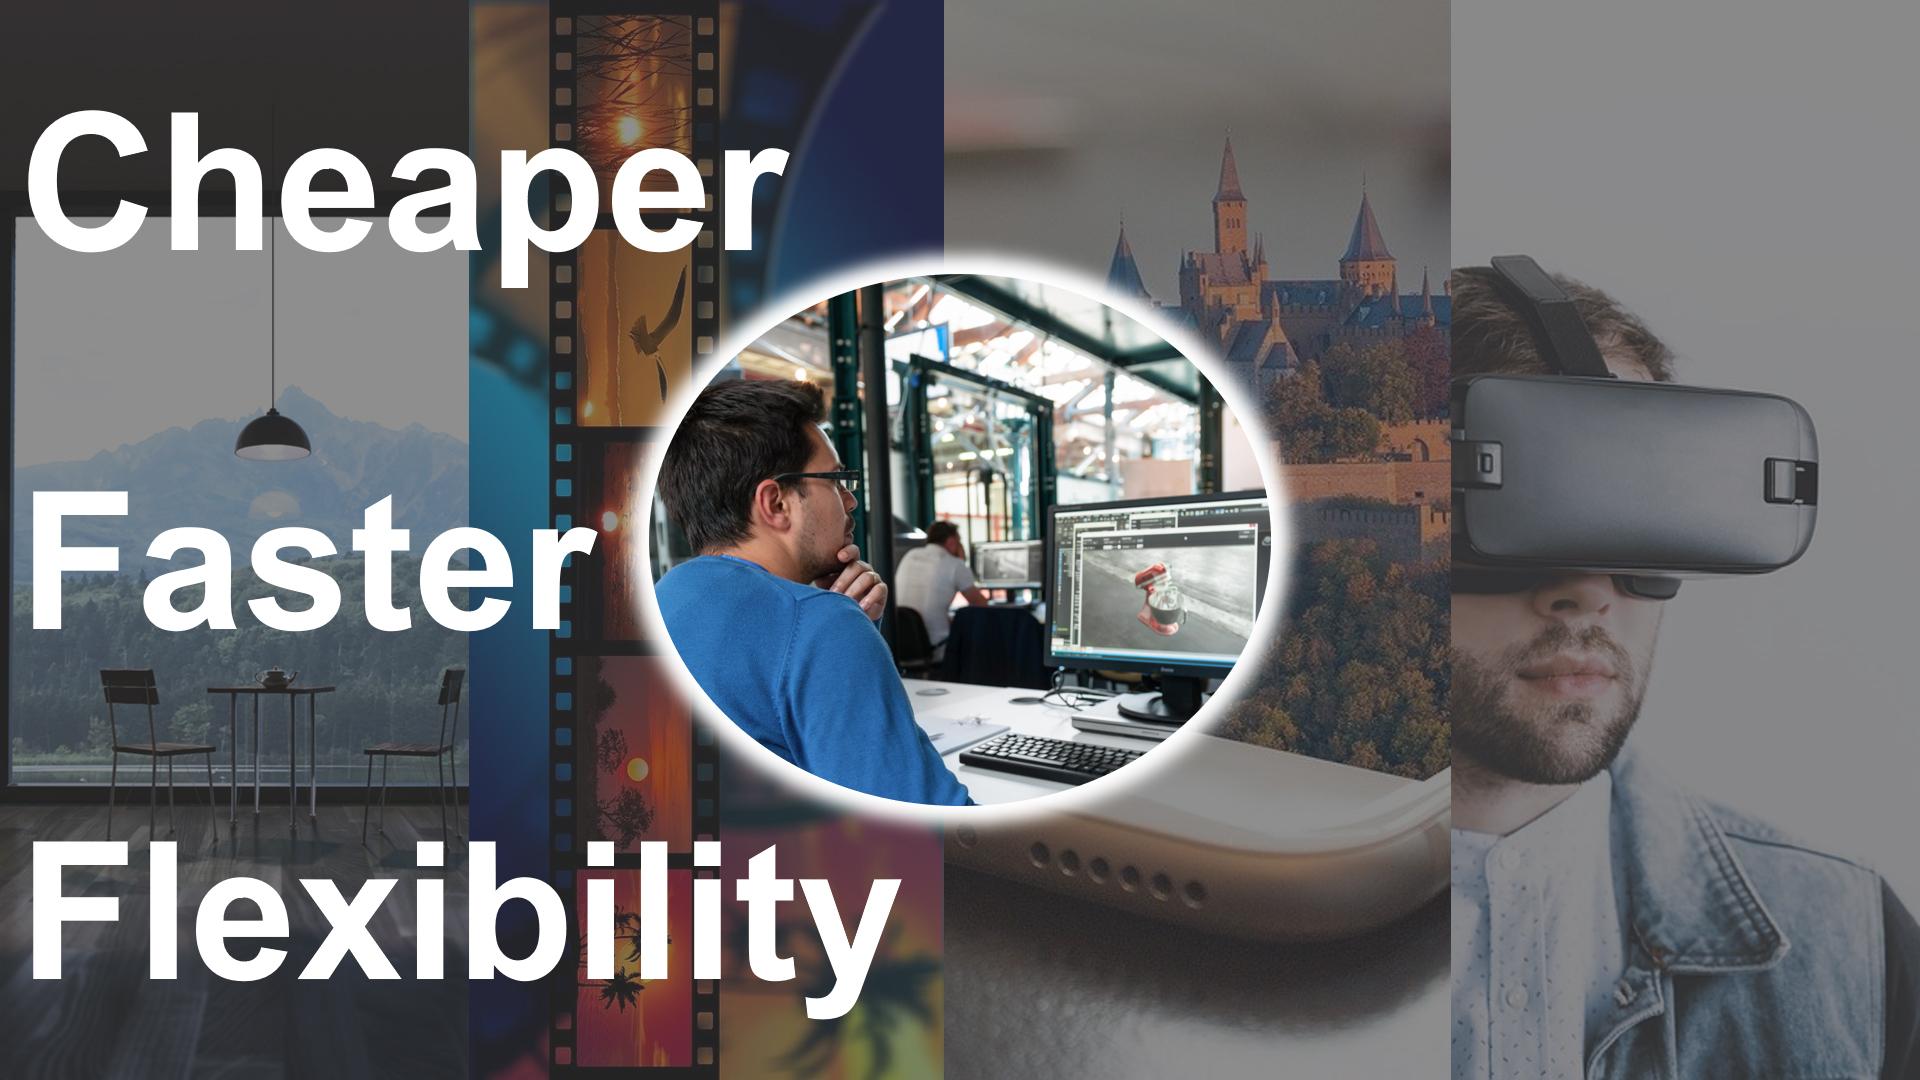 Cheaper Faster Flexibility